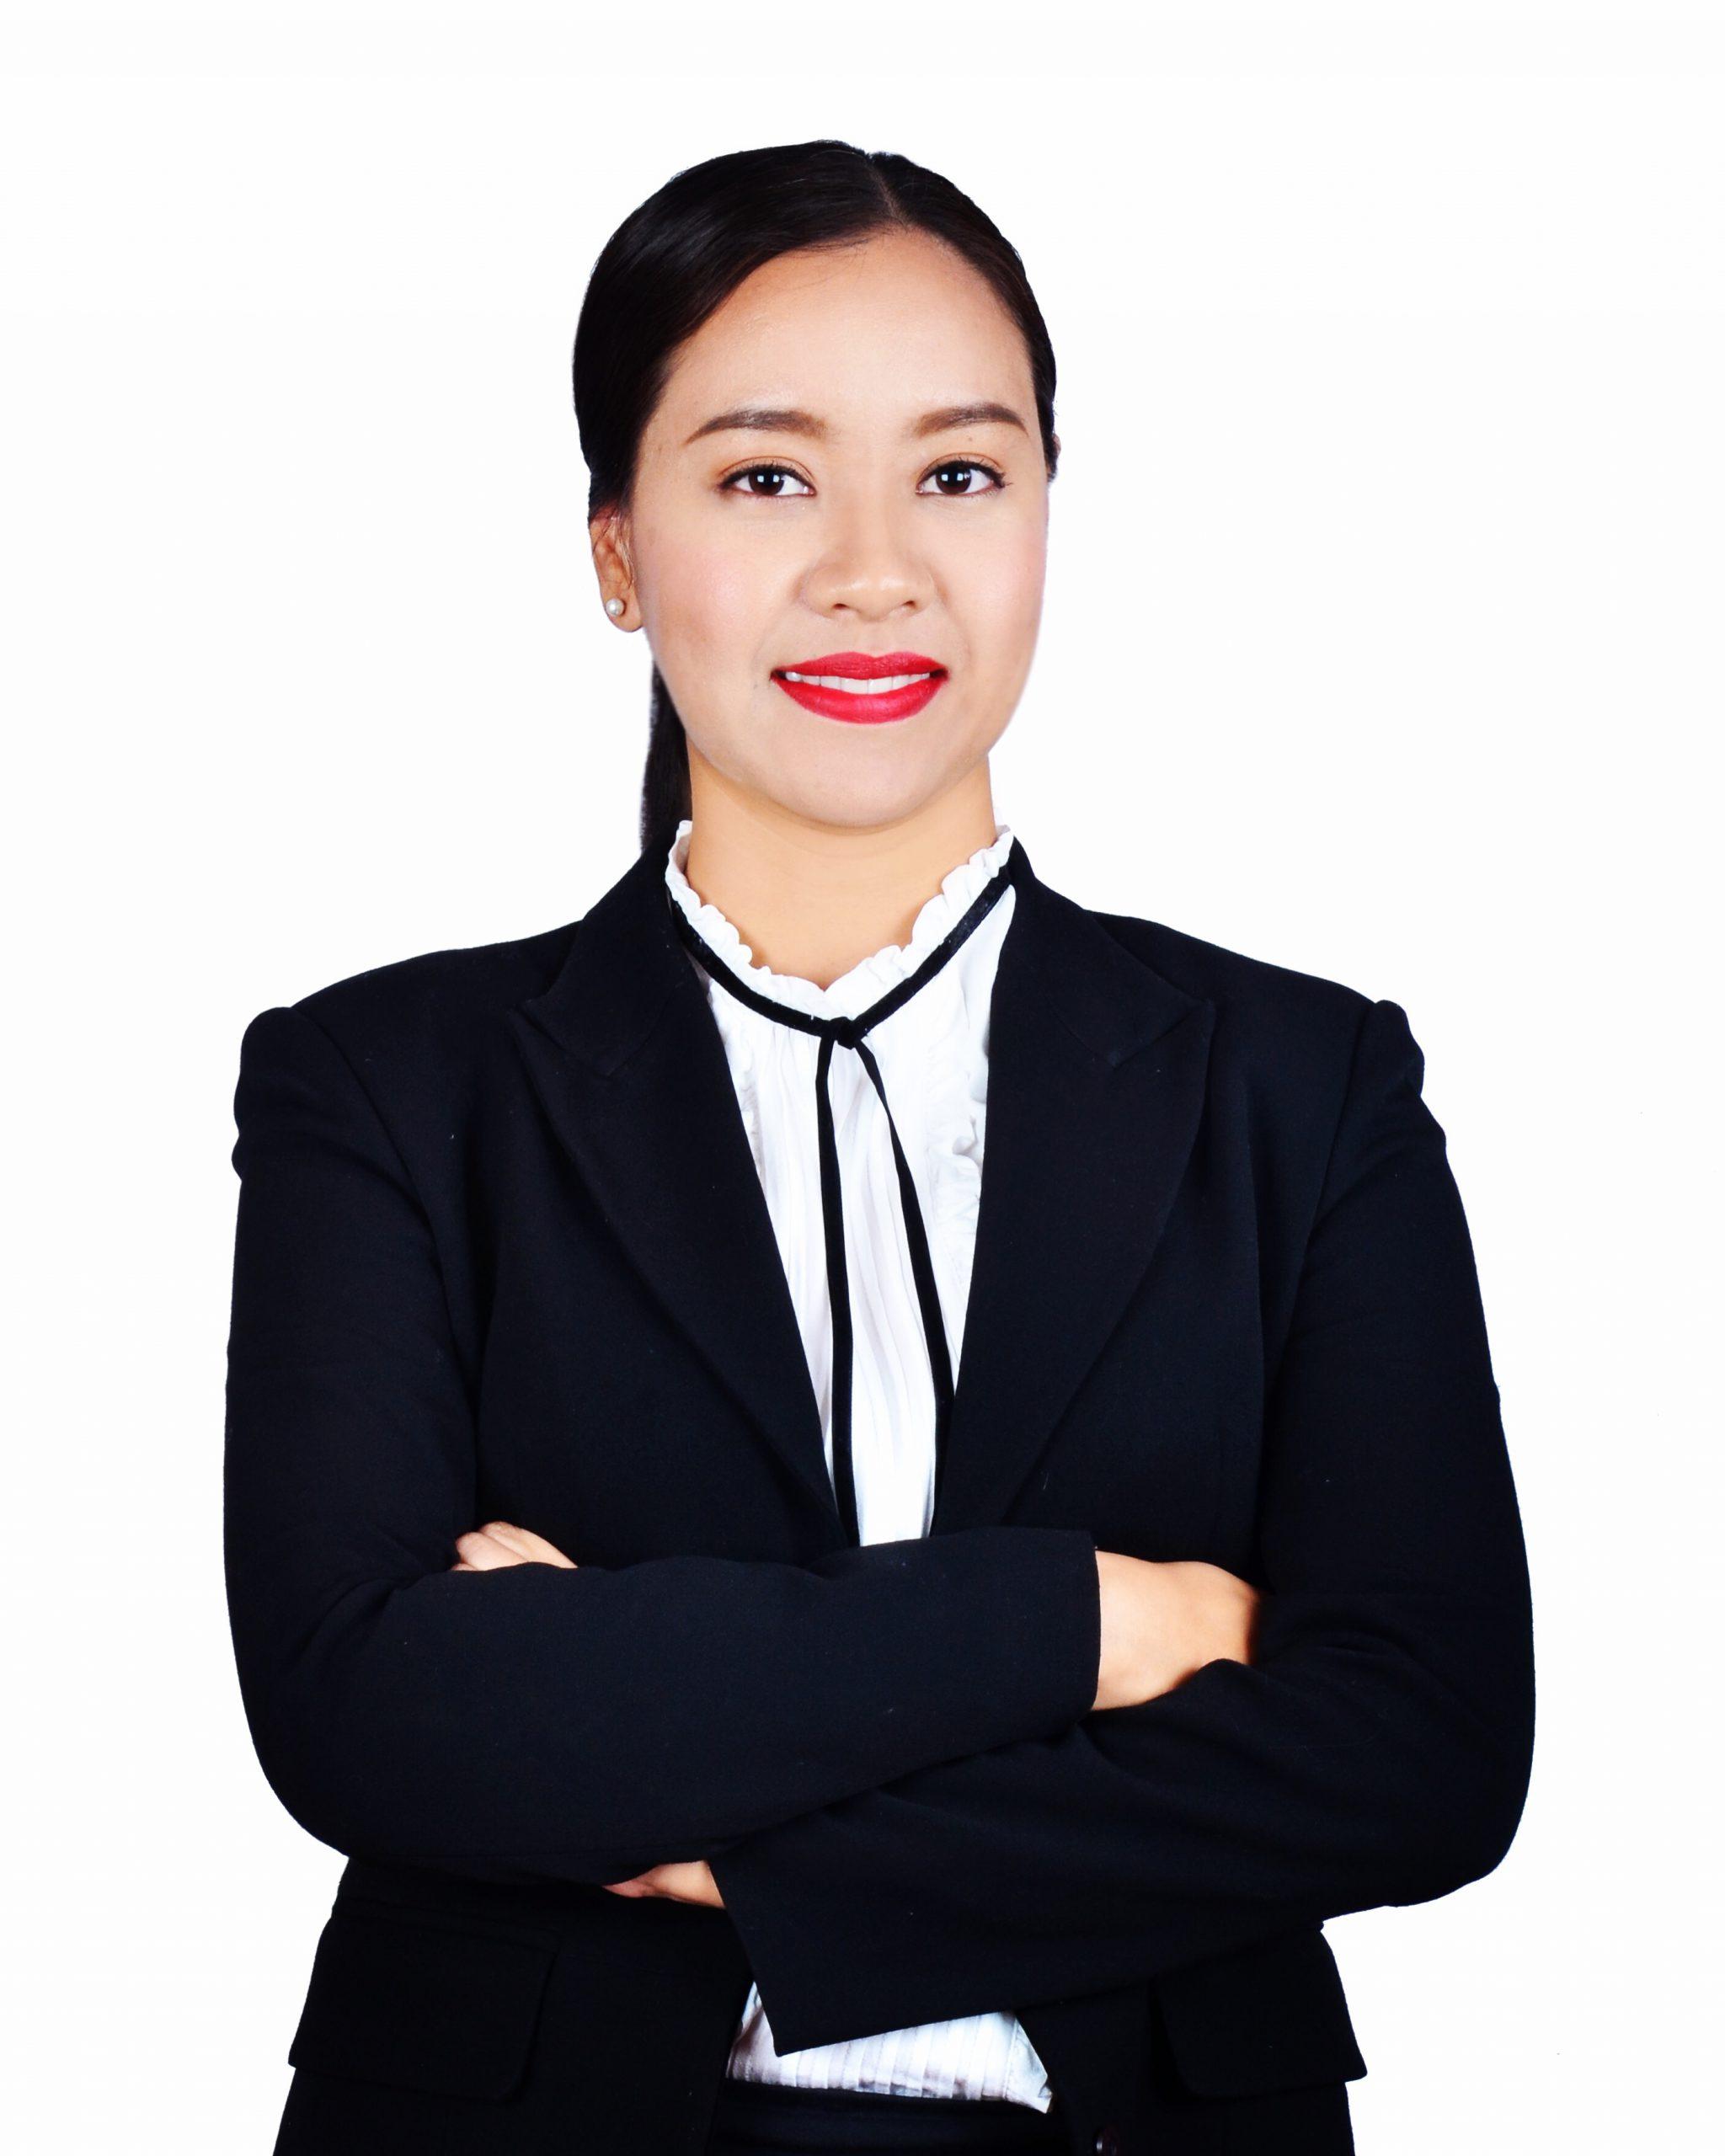 Sirilak Thopwong